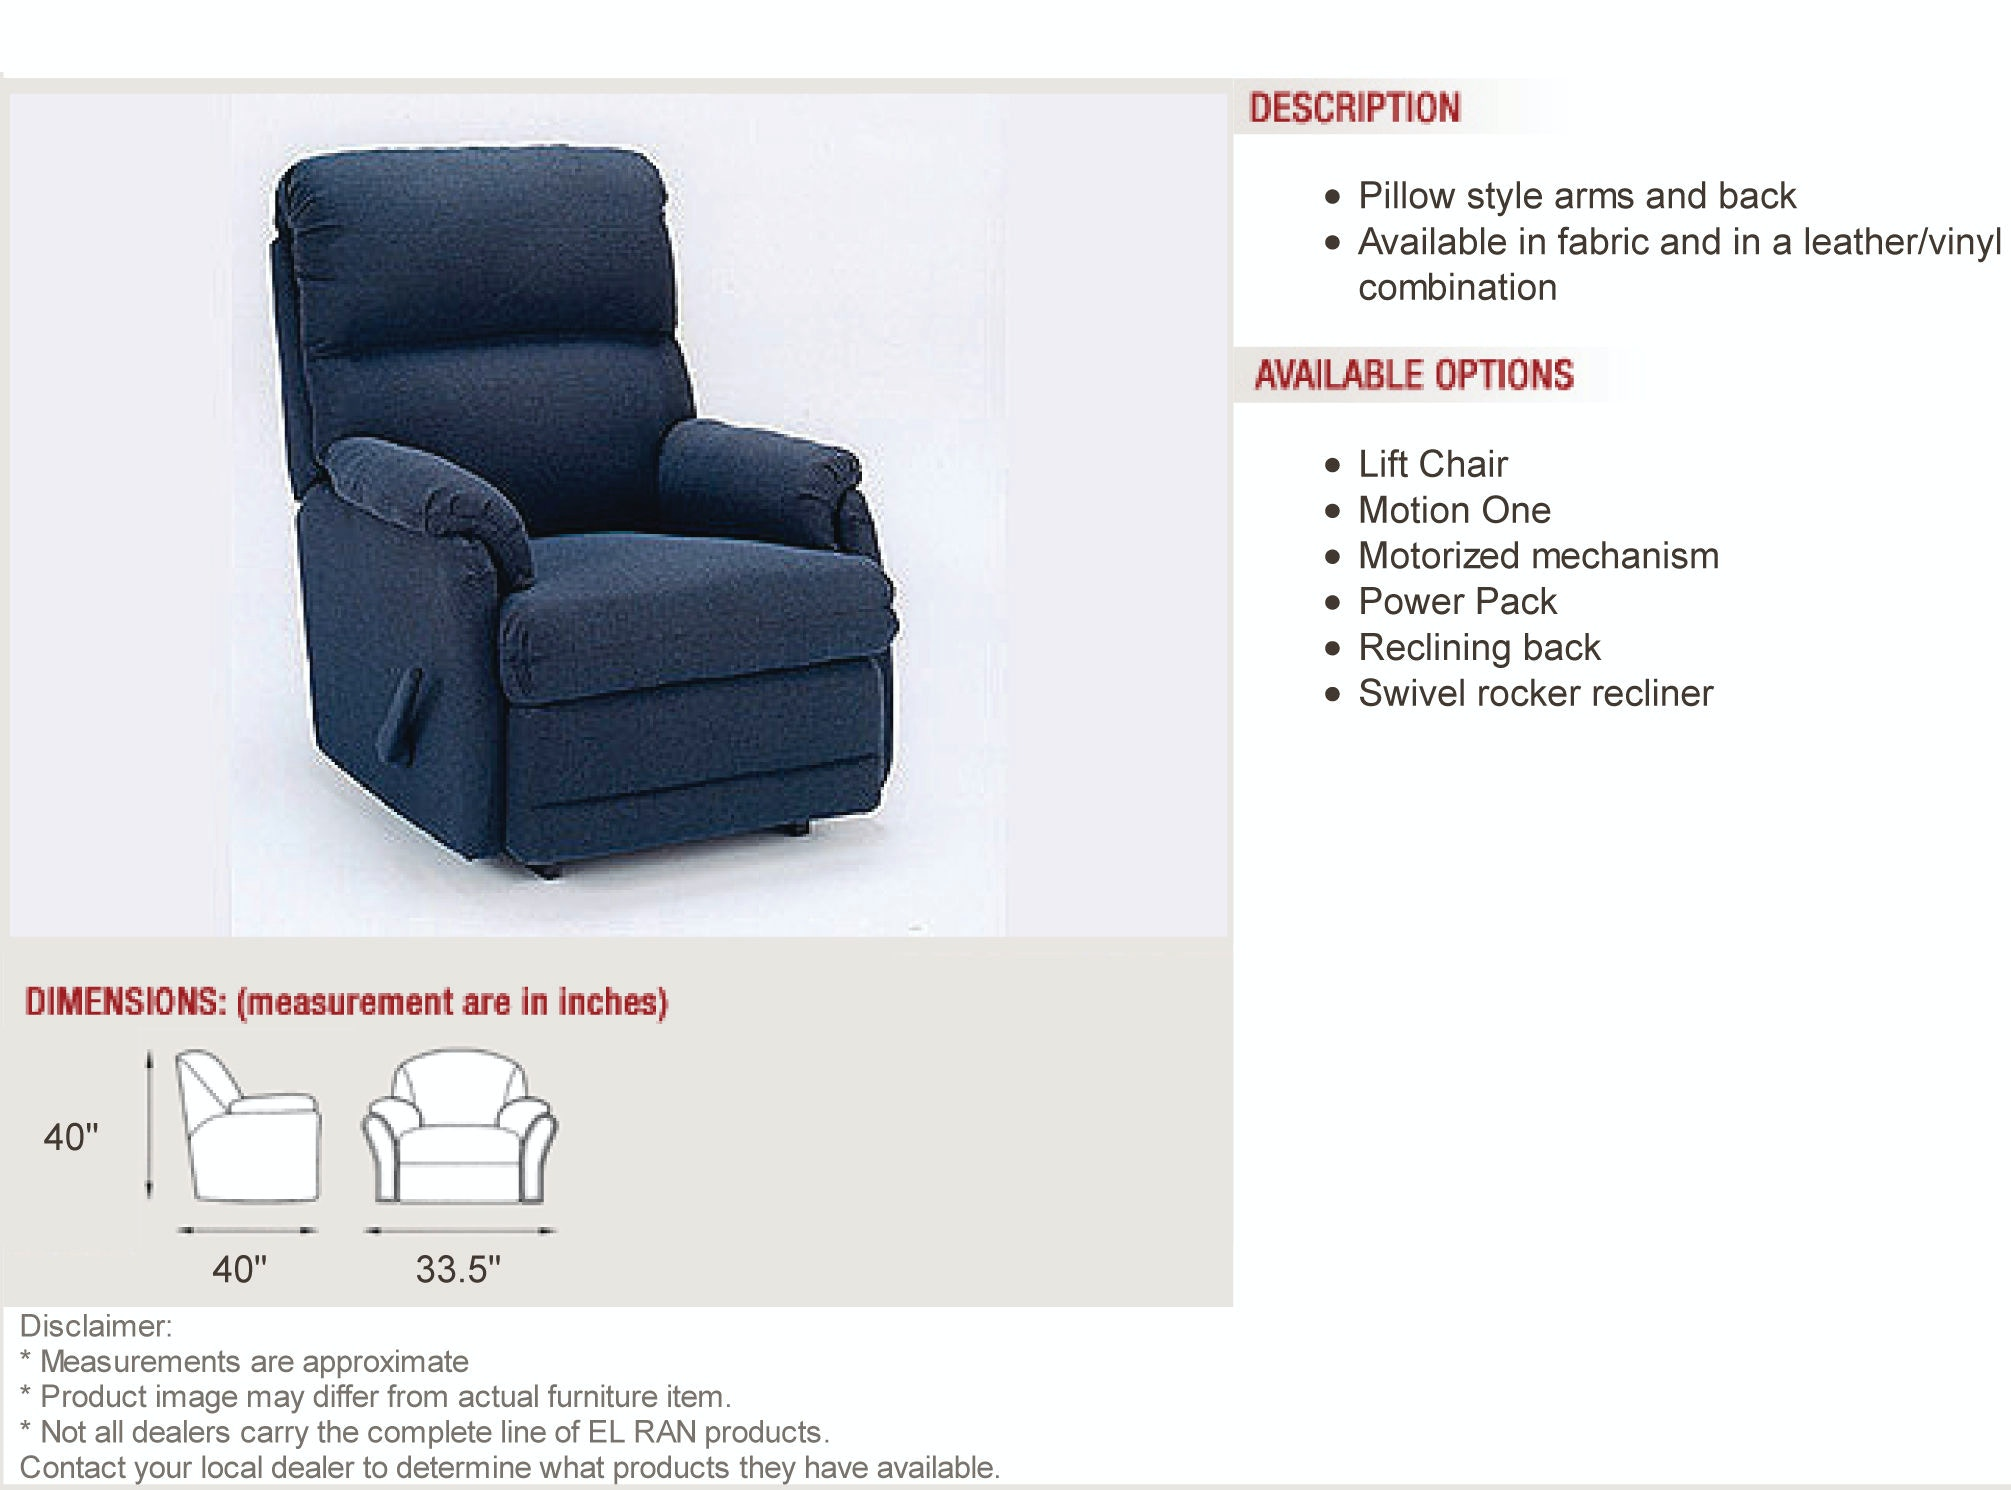 Elran Swivel Rocker Recliner ERC0012-03  sc 1 st  Borofkau0027s Furniture & Elran Living Room Swivel Rocker Recliner ERC0012-03 - Borofkau0027s ... islam-shia.org